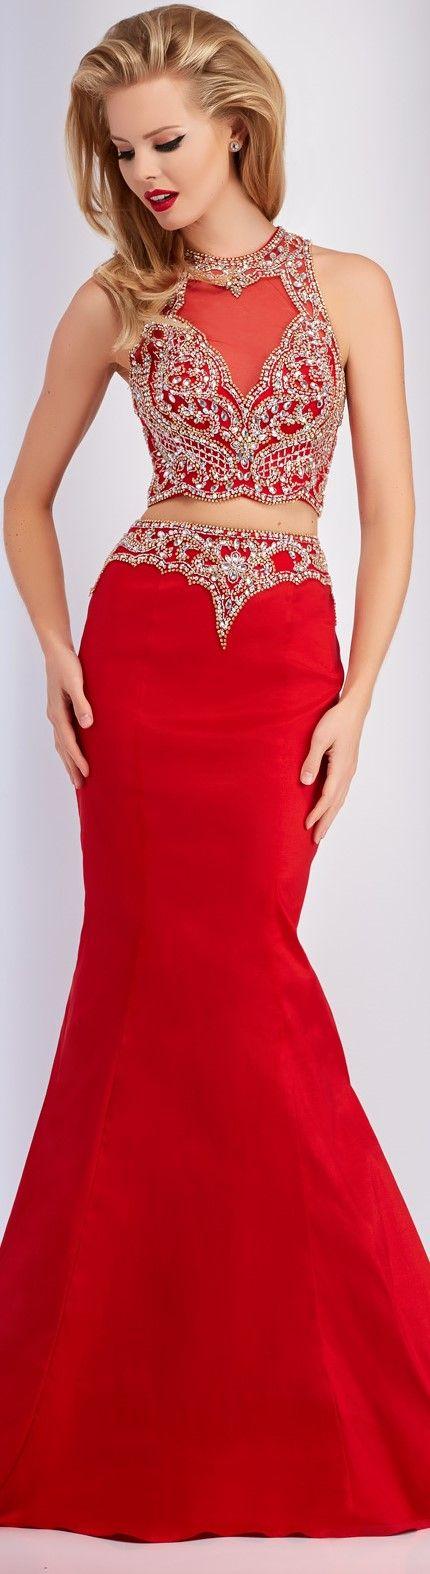 Clarisse Couture Dress 4717